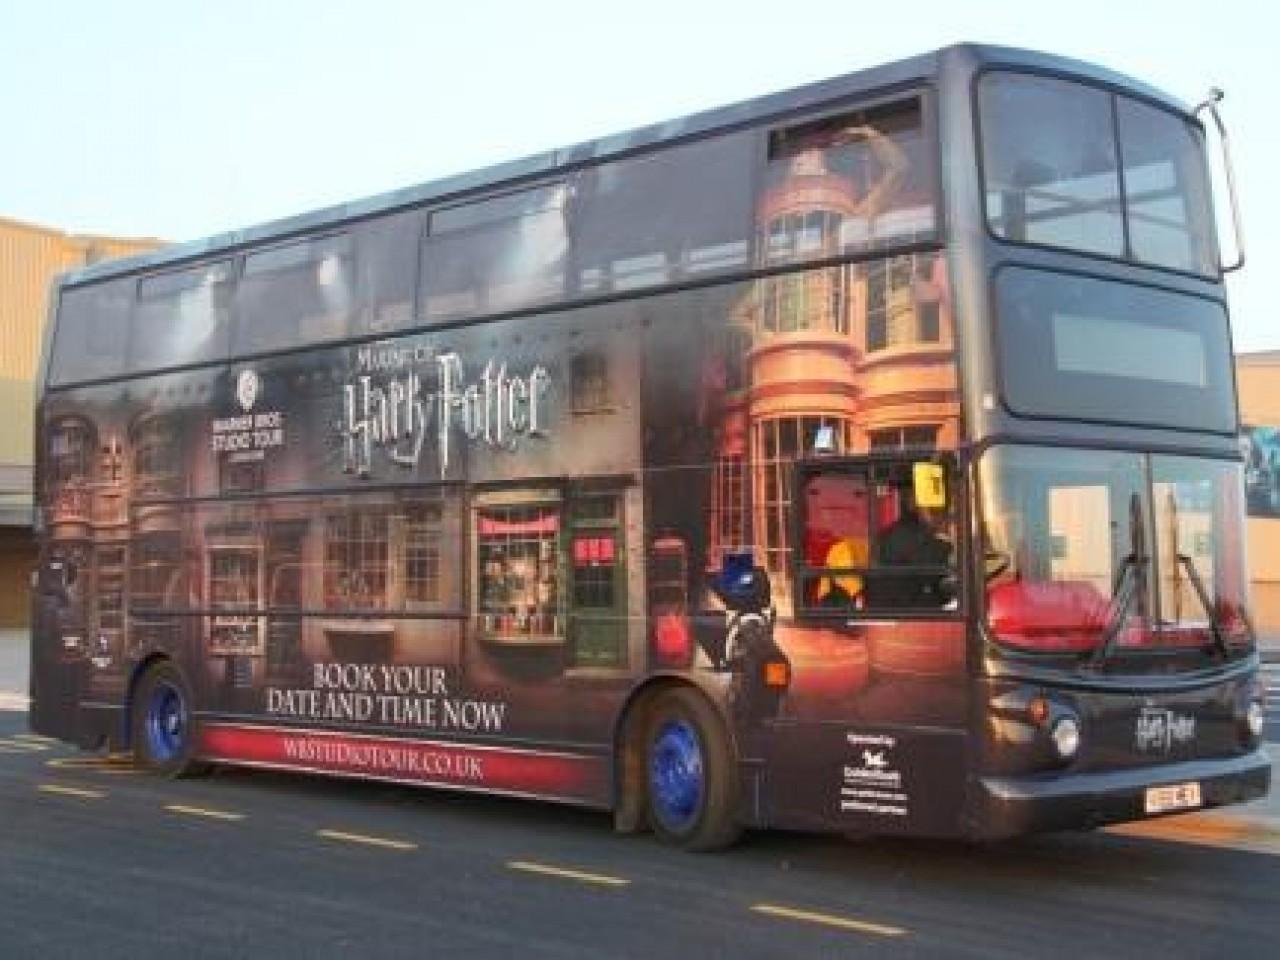 Harry Potter Warner Brothers